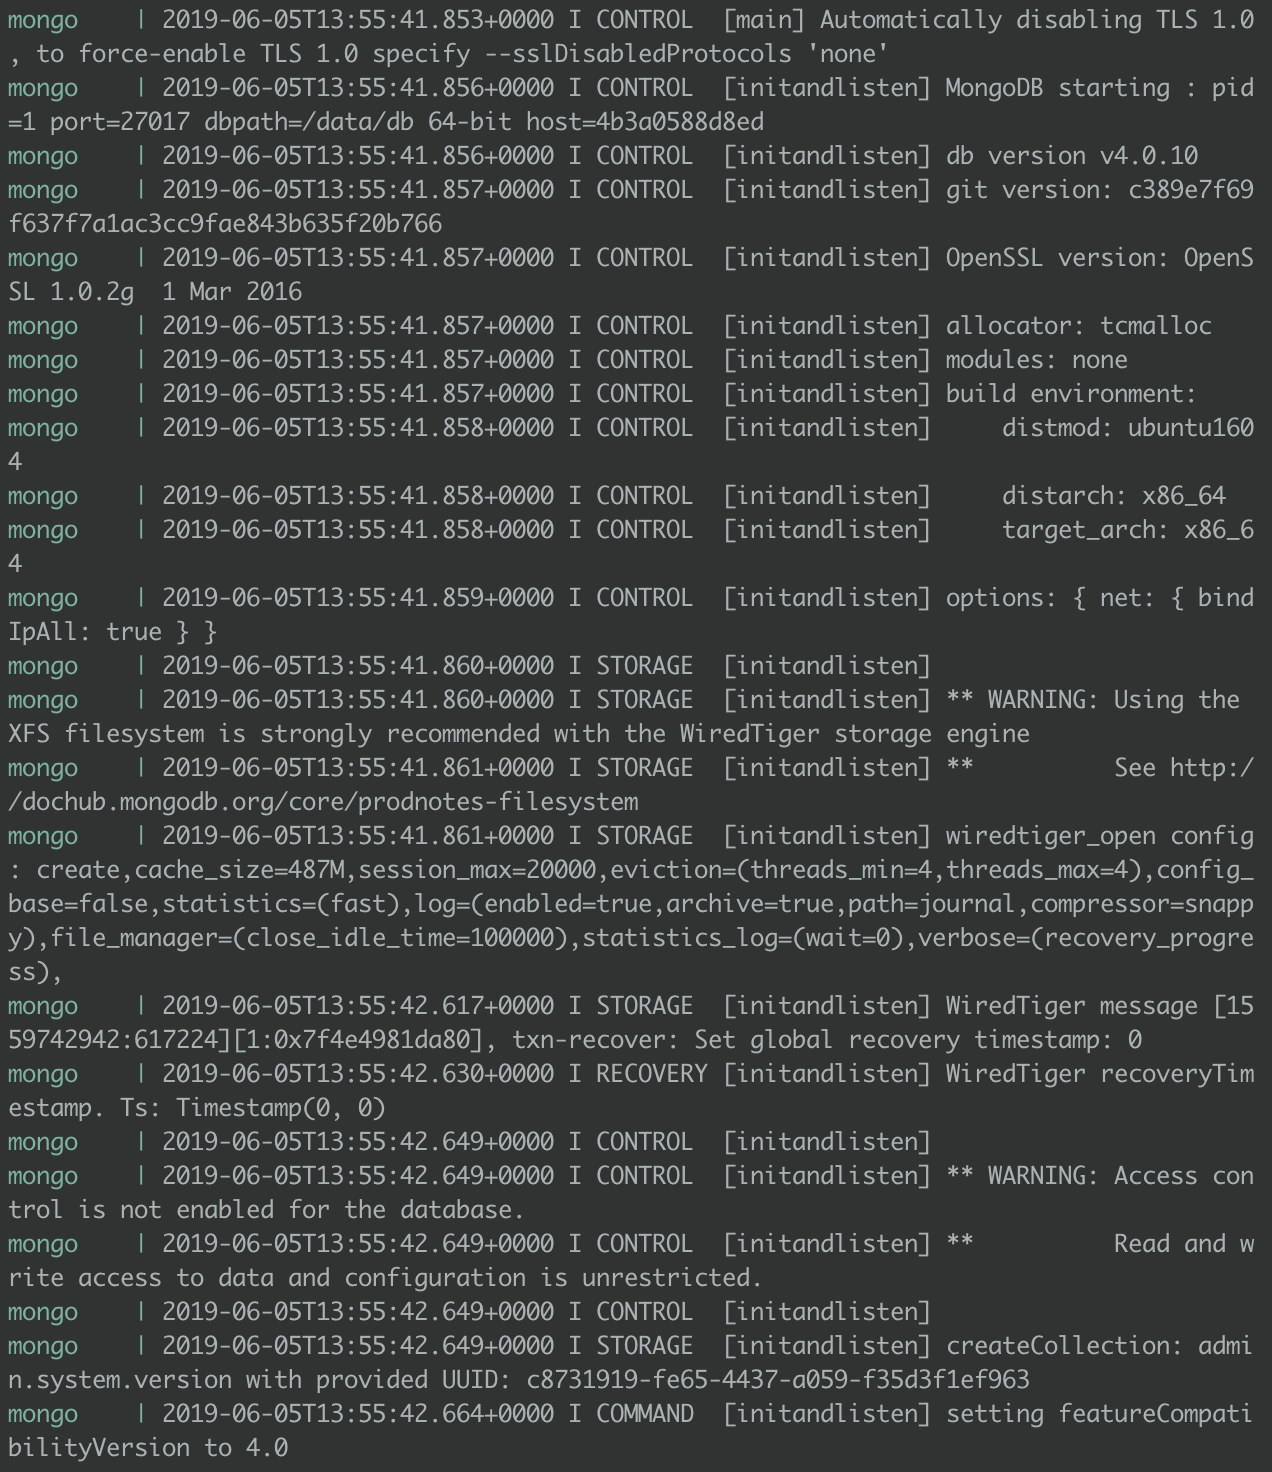 Screenshot 2019-06-05 at 4.57.14 PM.png